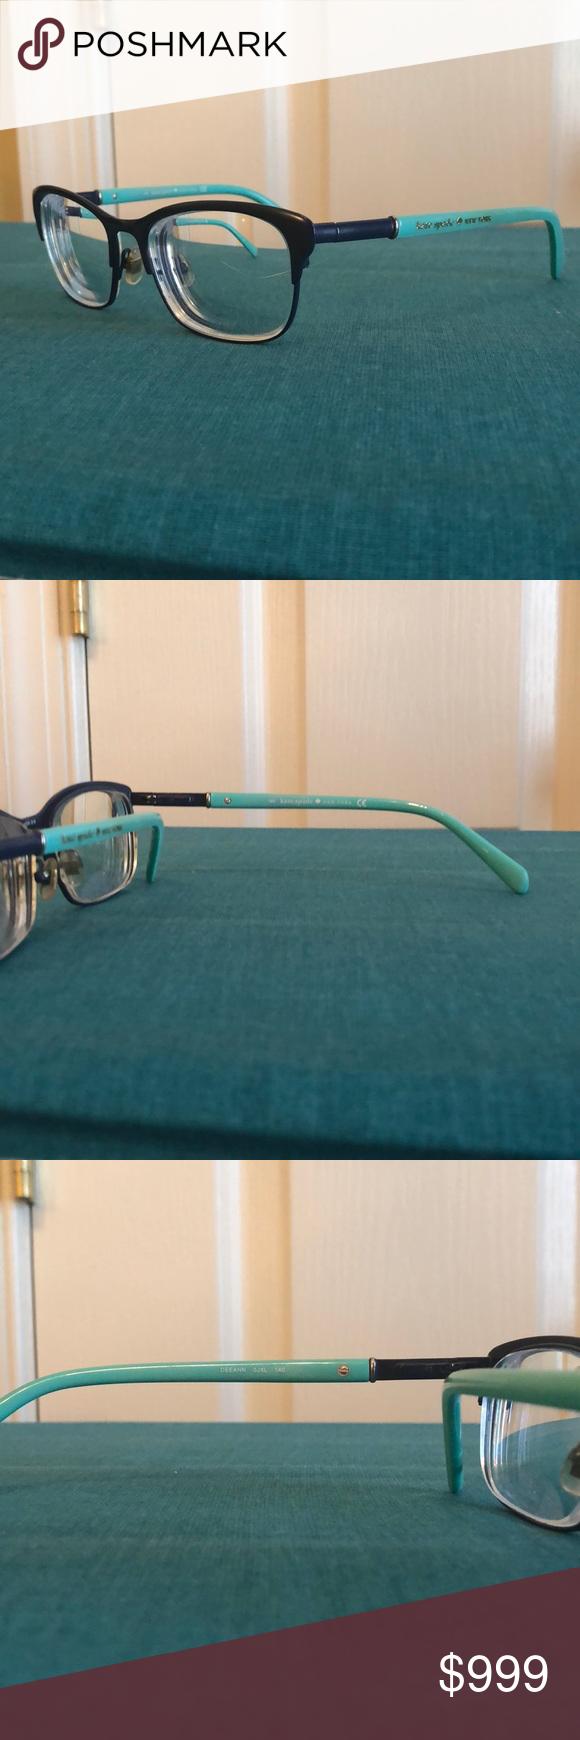 Kate Spade Teal and Blue Deeann Frames These Deeann frames ...